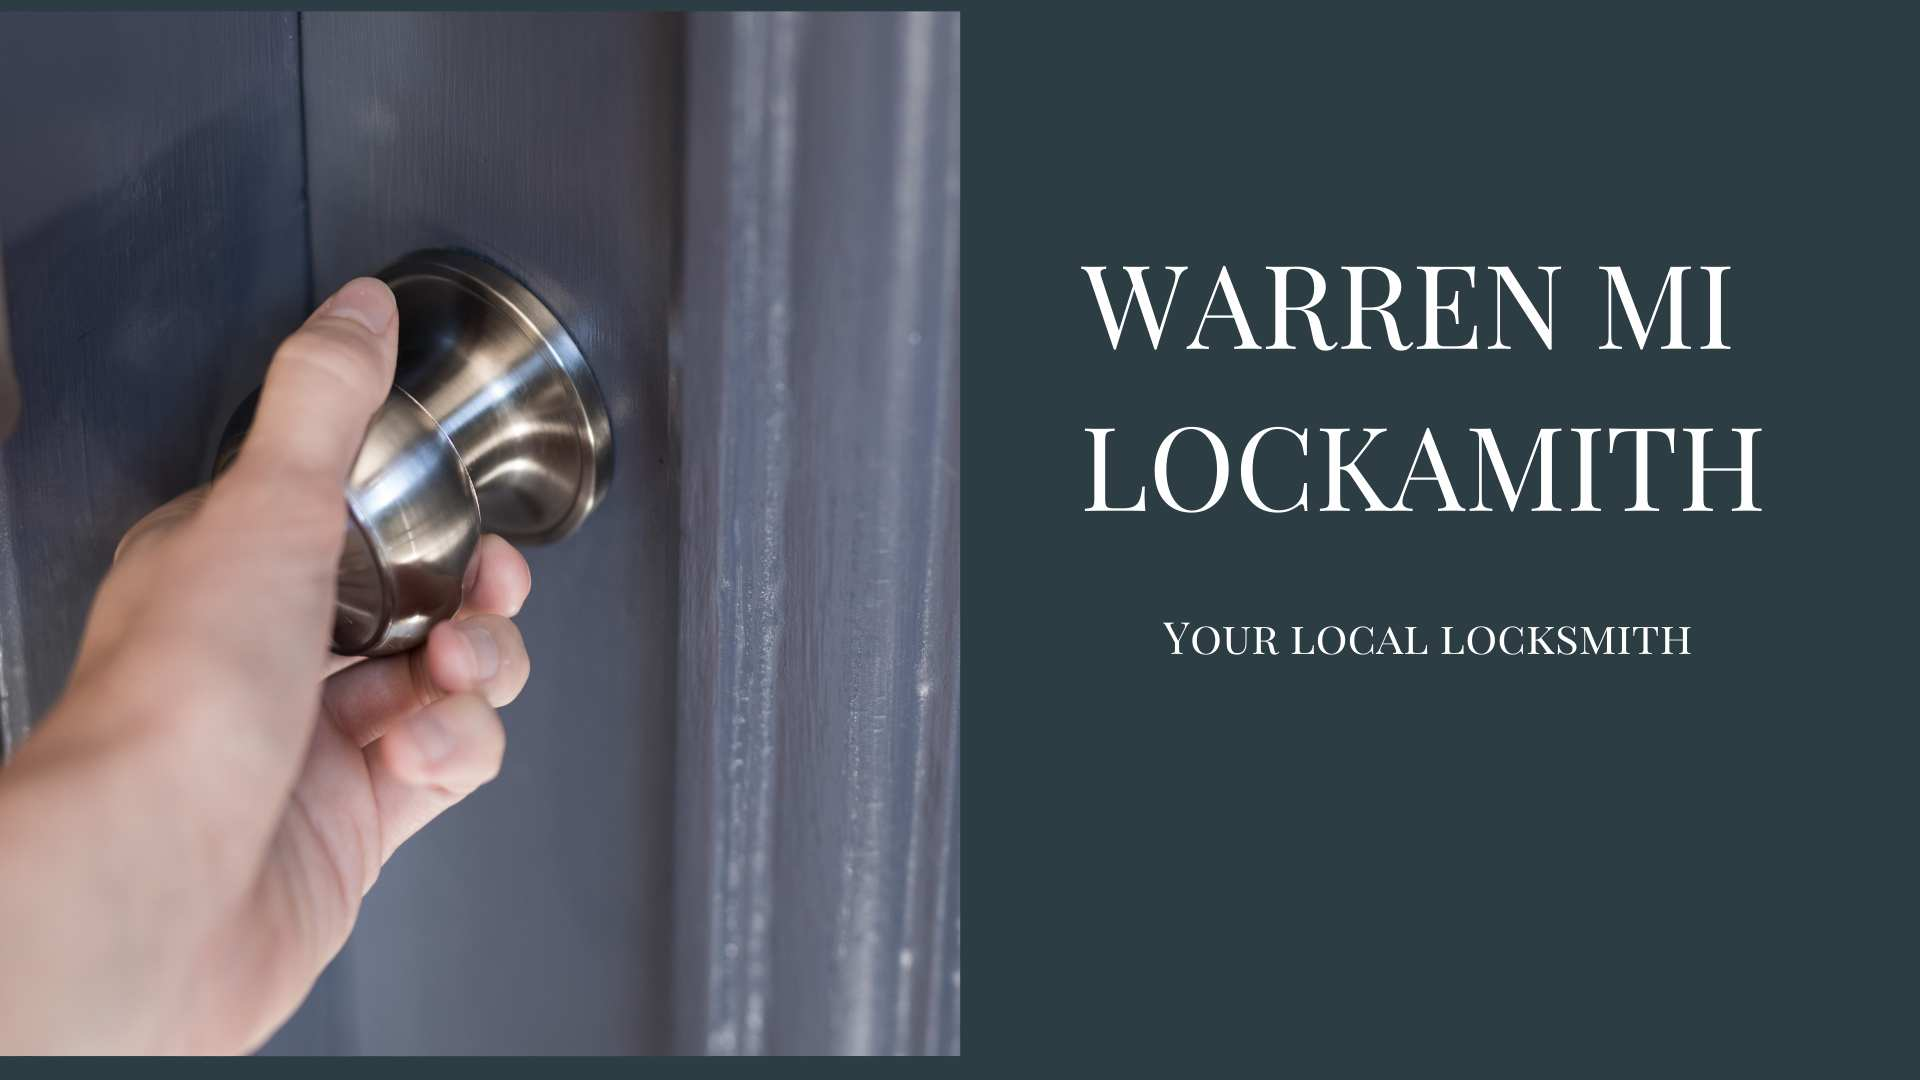 WARREN Locksmith call us now 313-329-6063